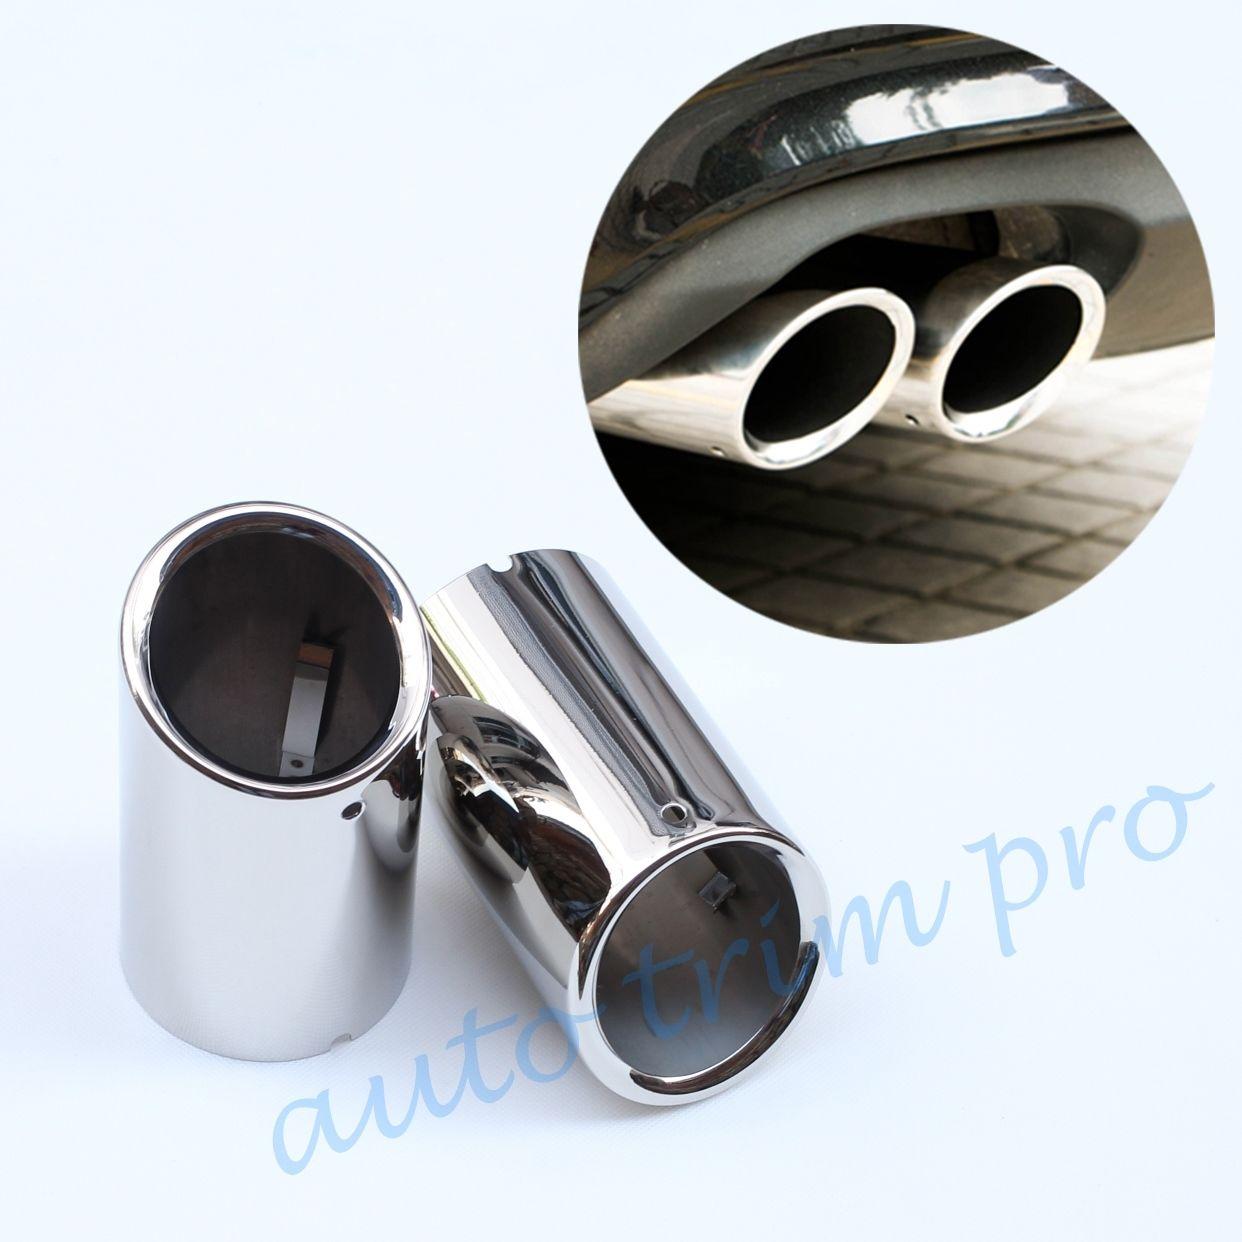 A Pair 4 Tip Dual Exhaust Muffler Silencer For Porsche Panamera Car Decorations